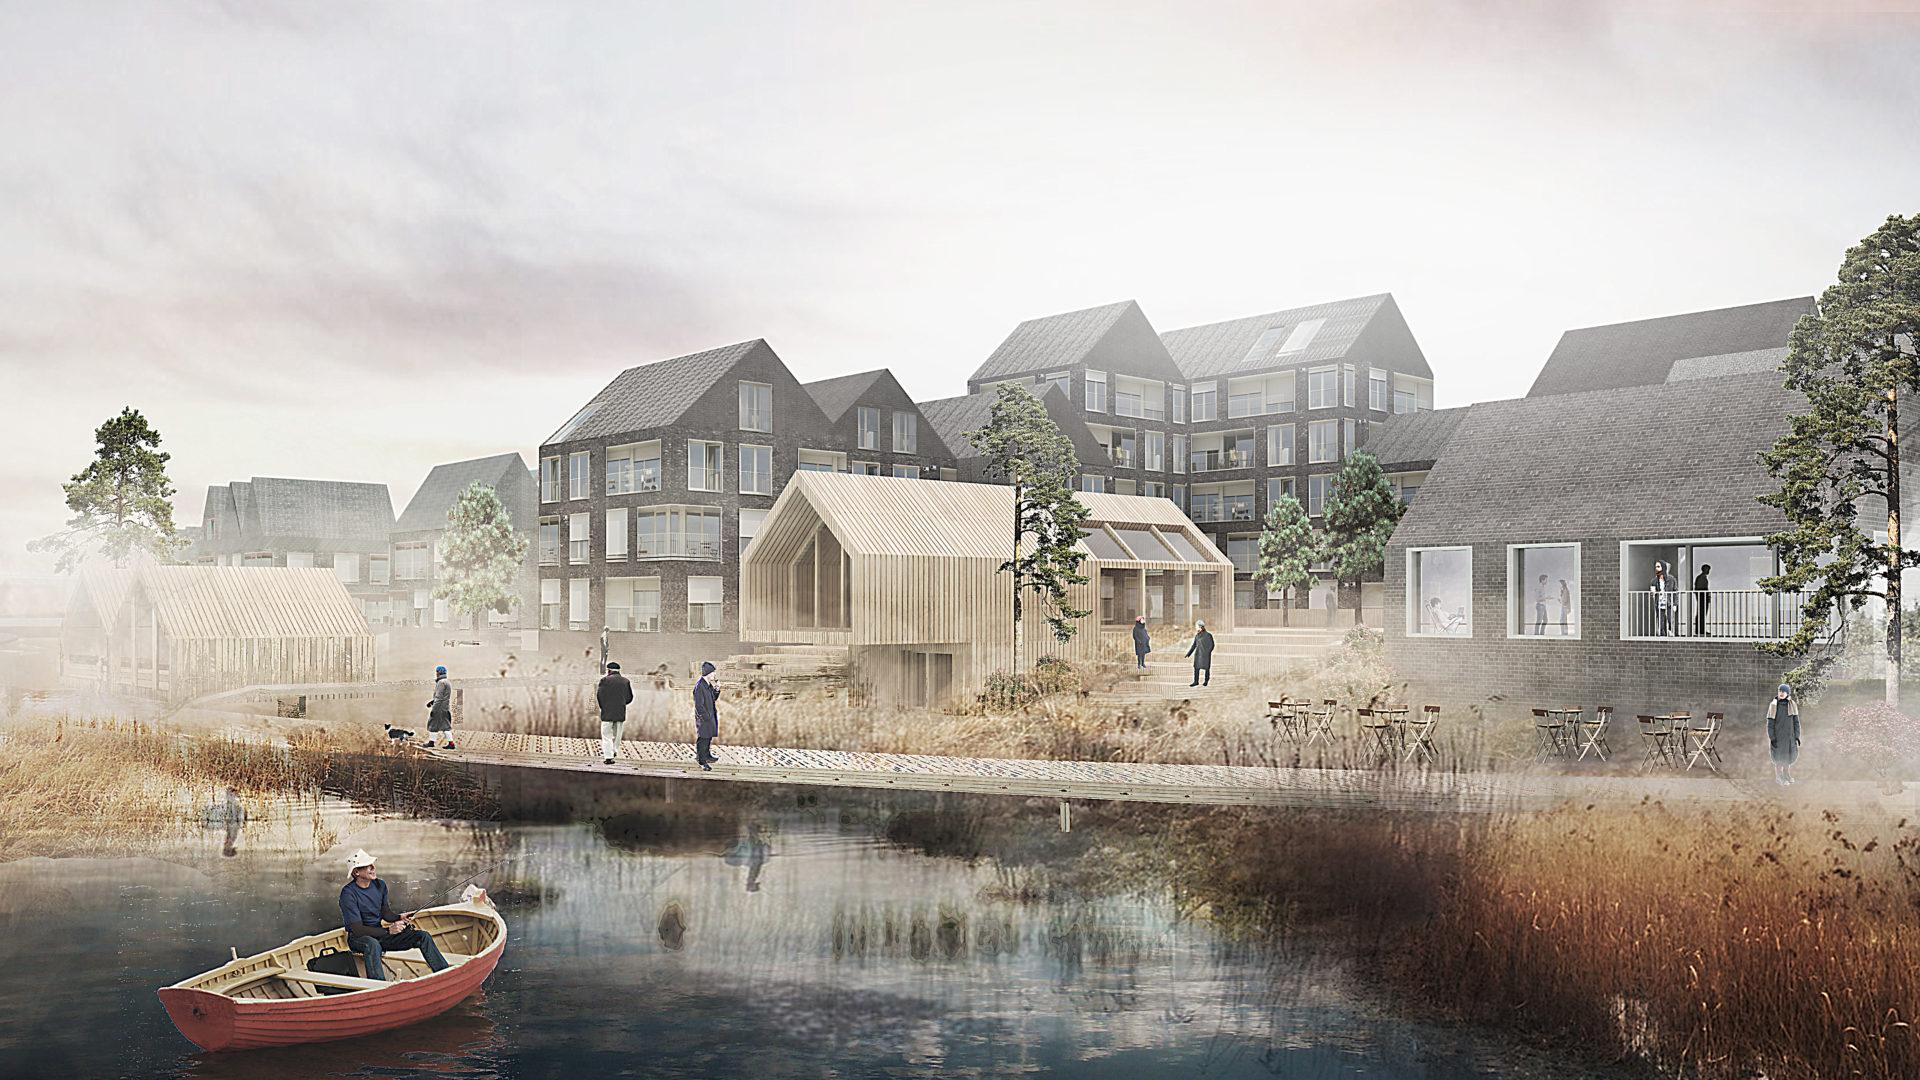 flood resilient architecture